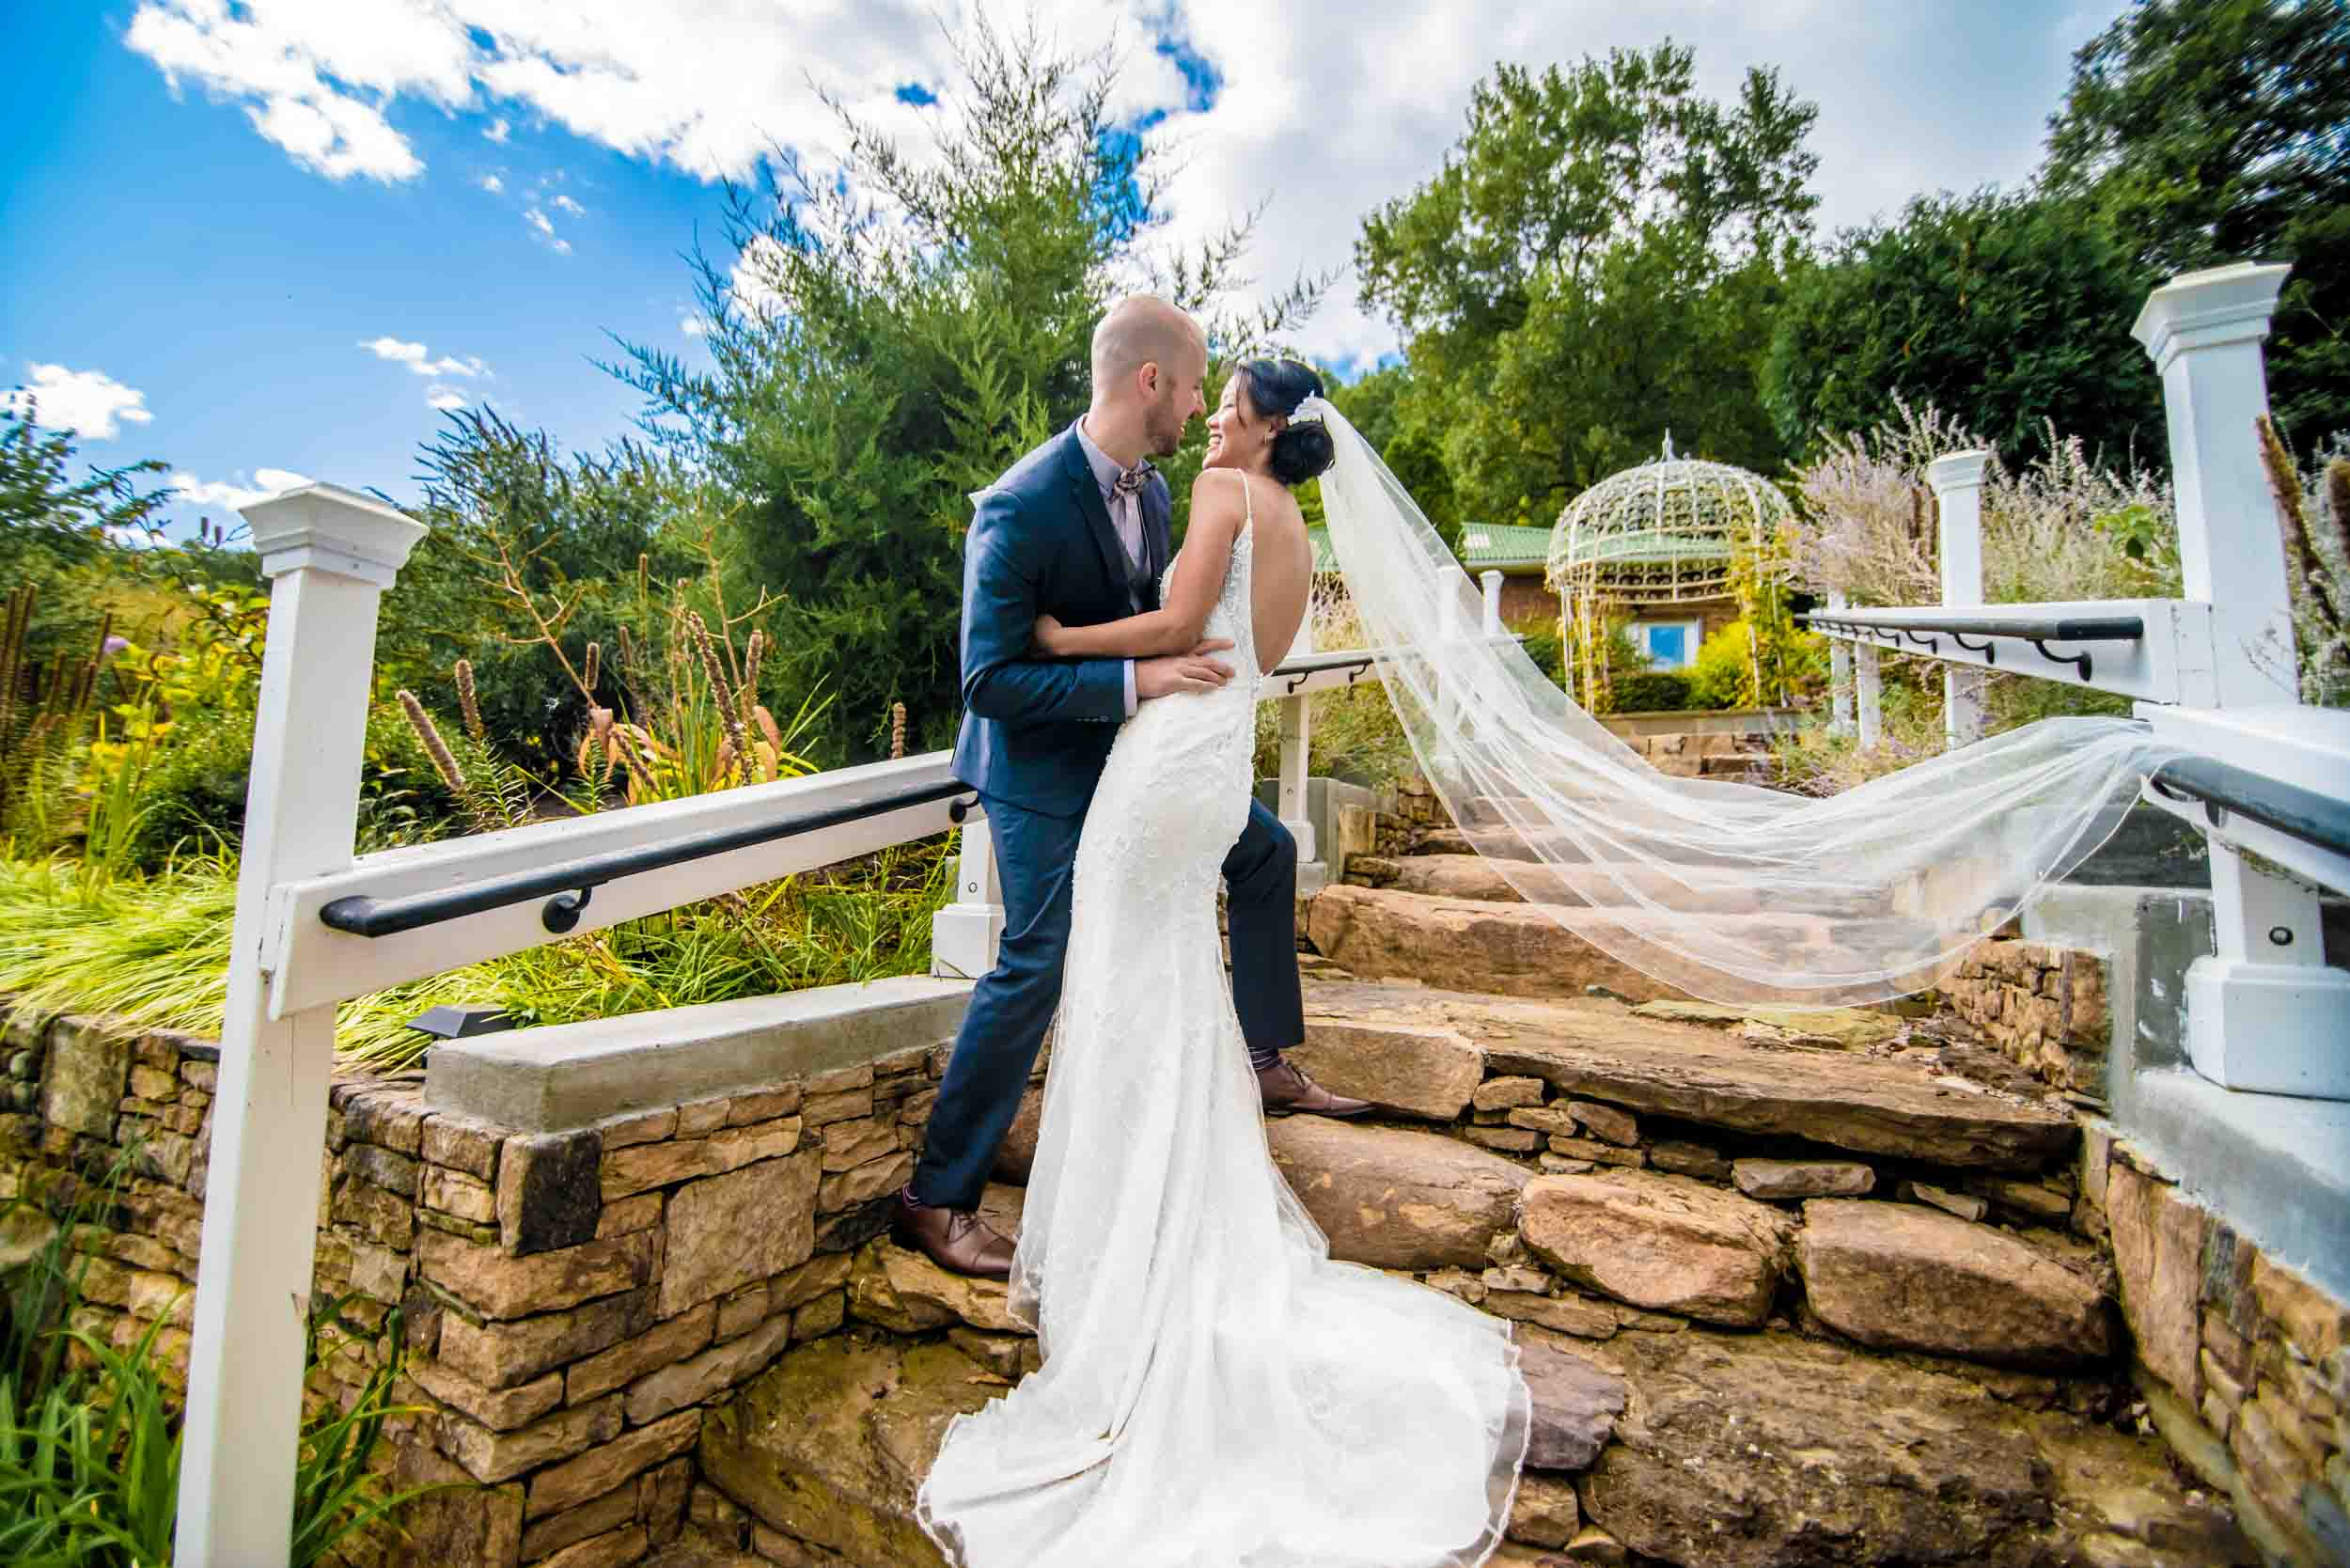 dc+metro+wedding+photographer+vadym+guliuk+photography+wedding+bride+and+groom-2059.jpg